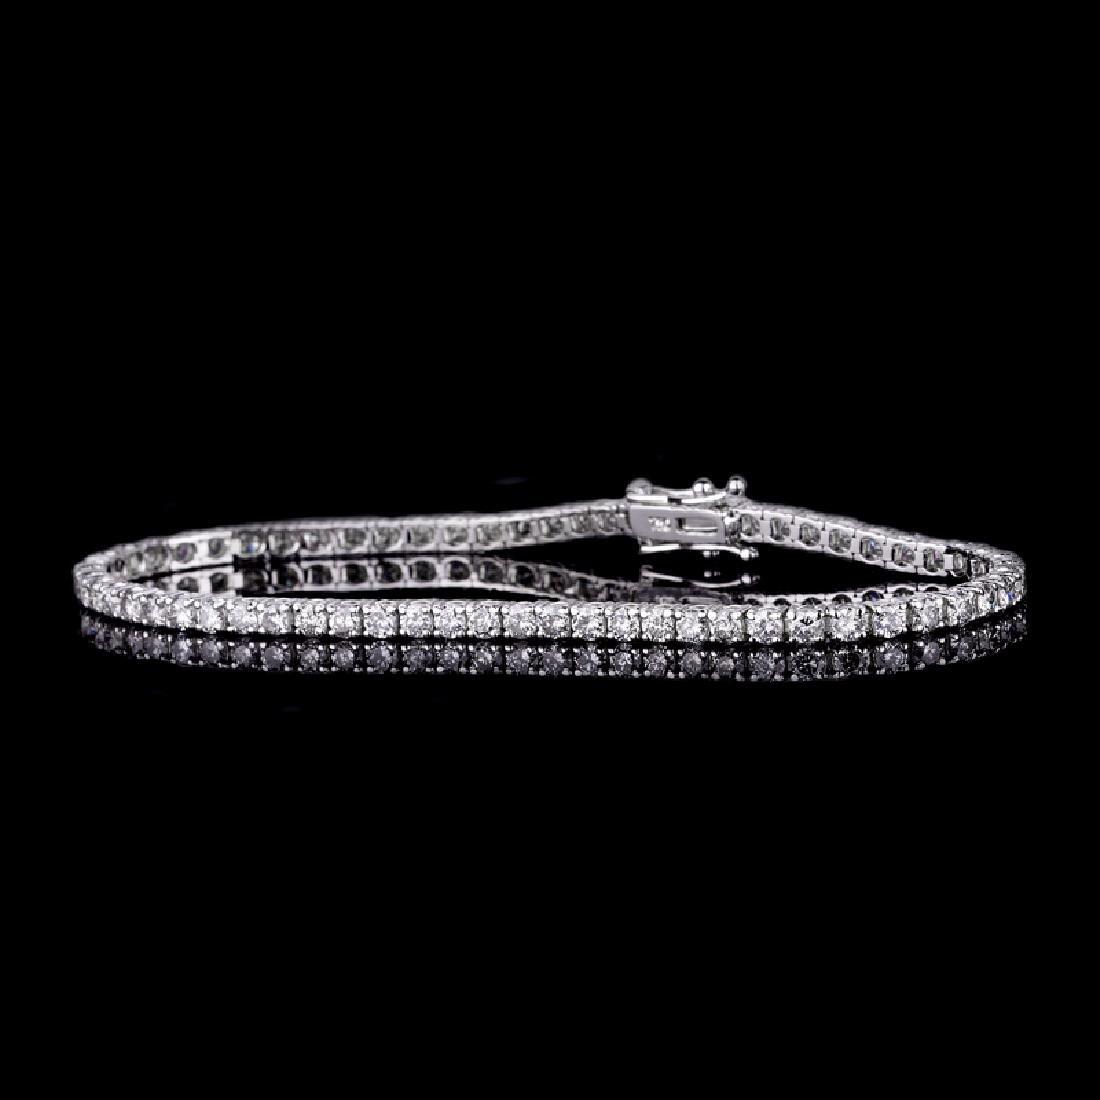 *Fine Jewelry 18 kt. White Gold, Custom Made 4.03CT